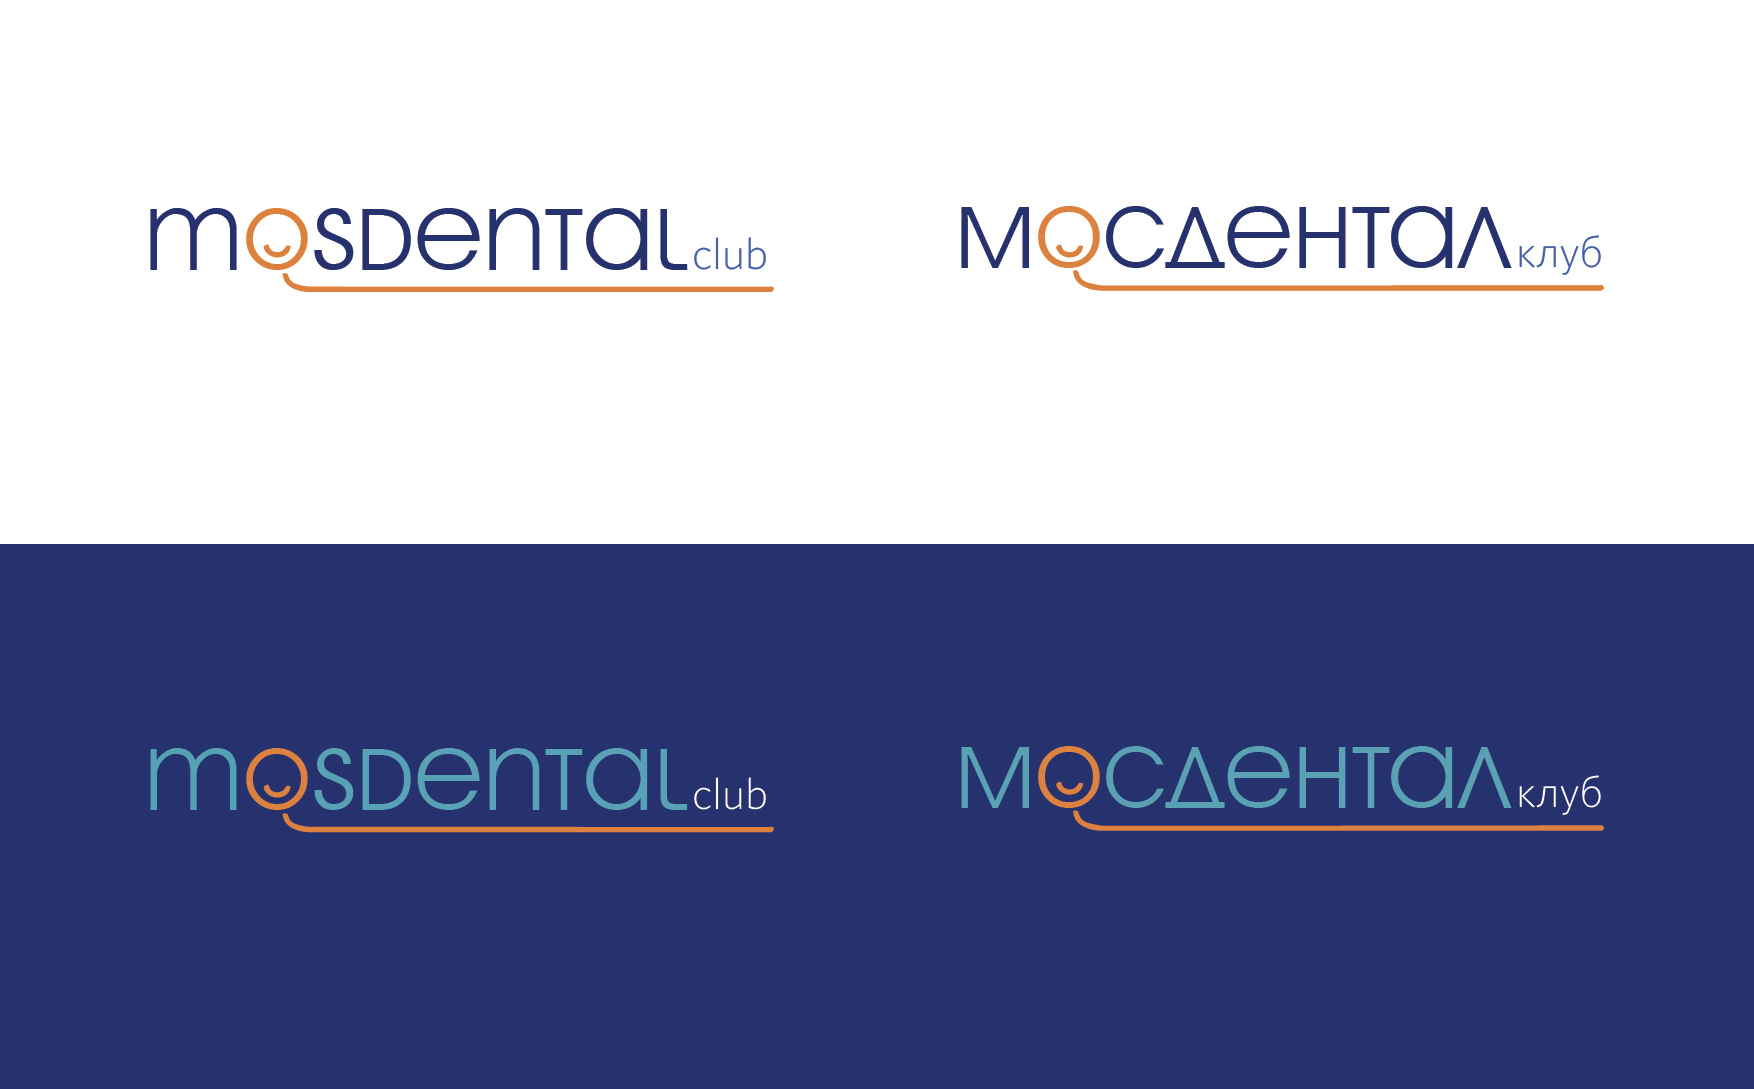 Разработка логотипа стоматологического медицинского центра фото f_7835e45db37ca4ef.jpg